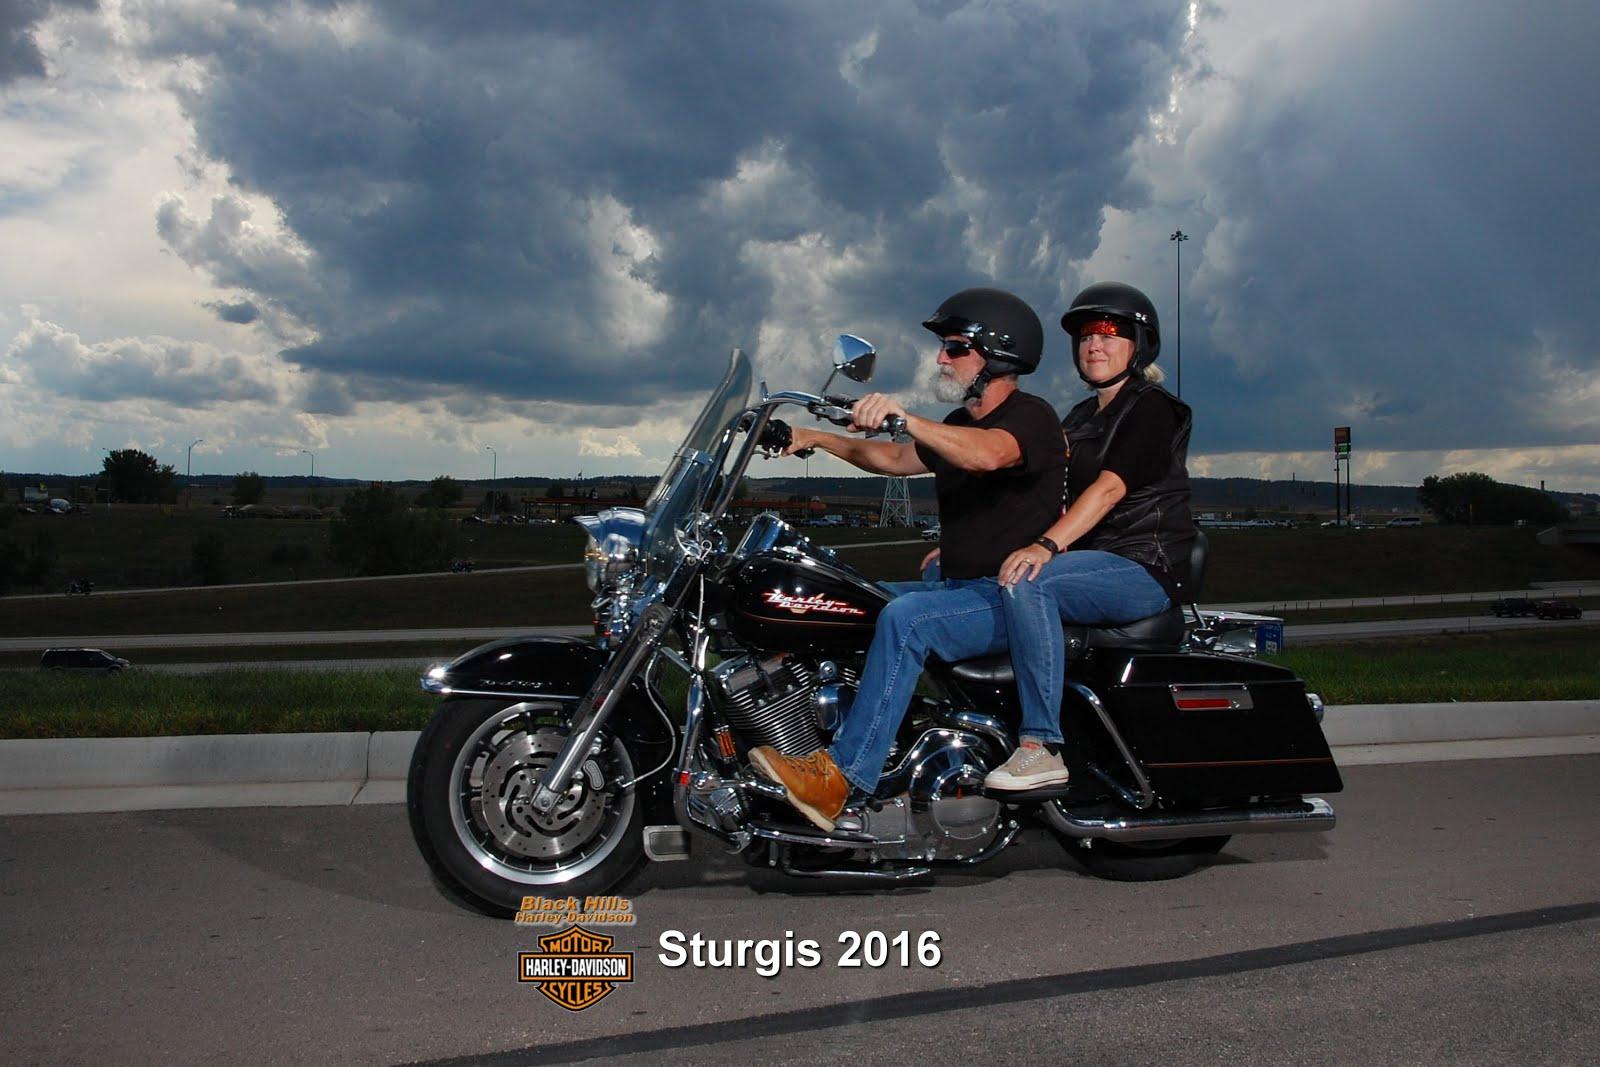 Sturgis 2016